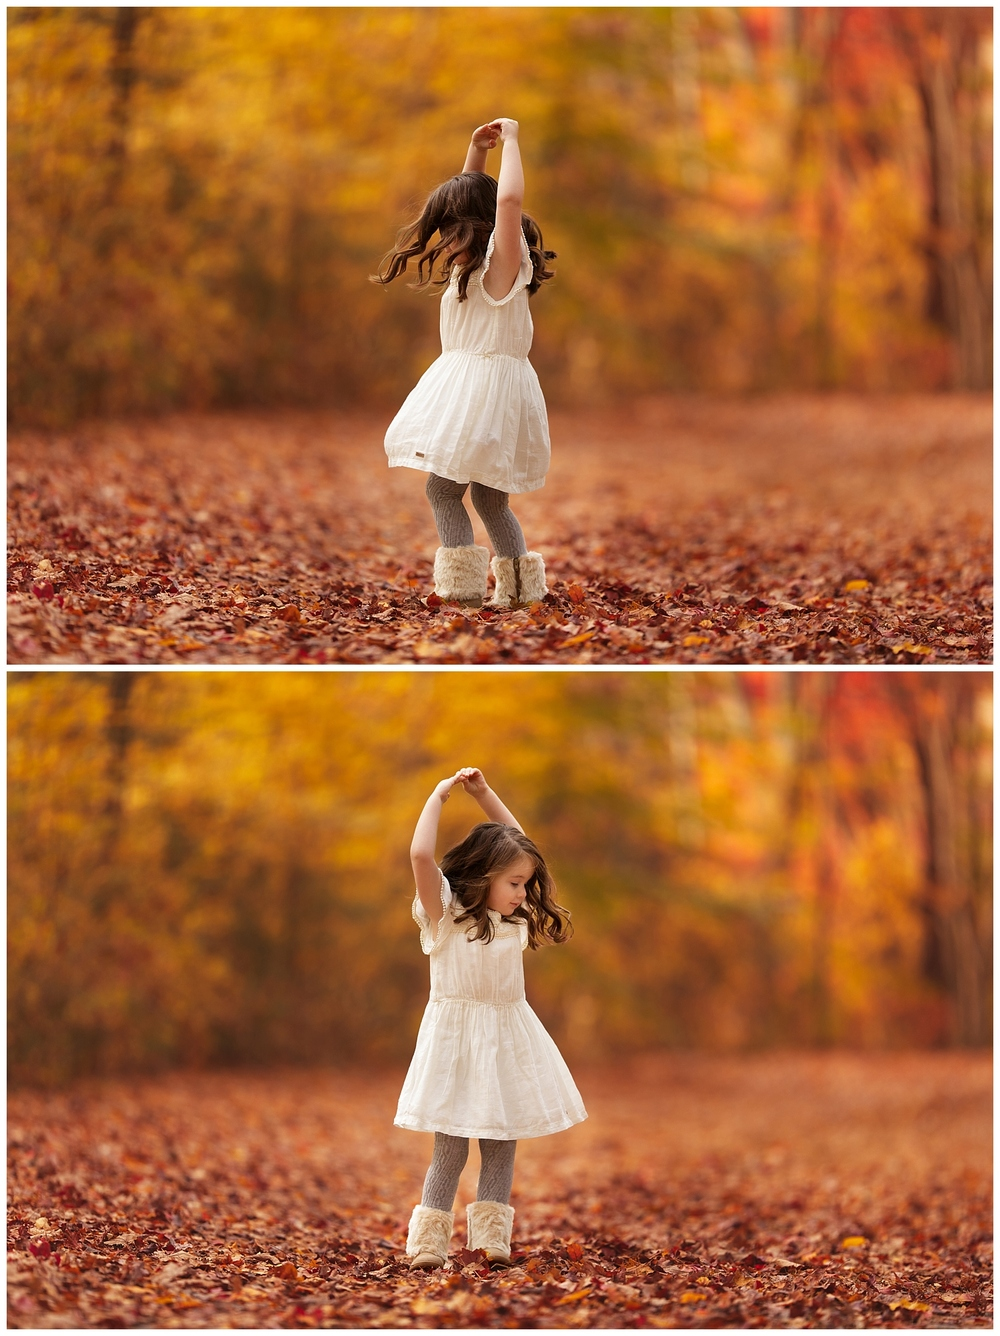 Amy Kristin Photography • Rhode Island Children's Photographer